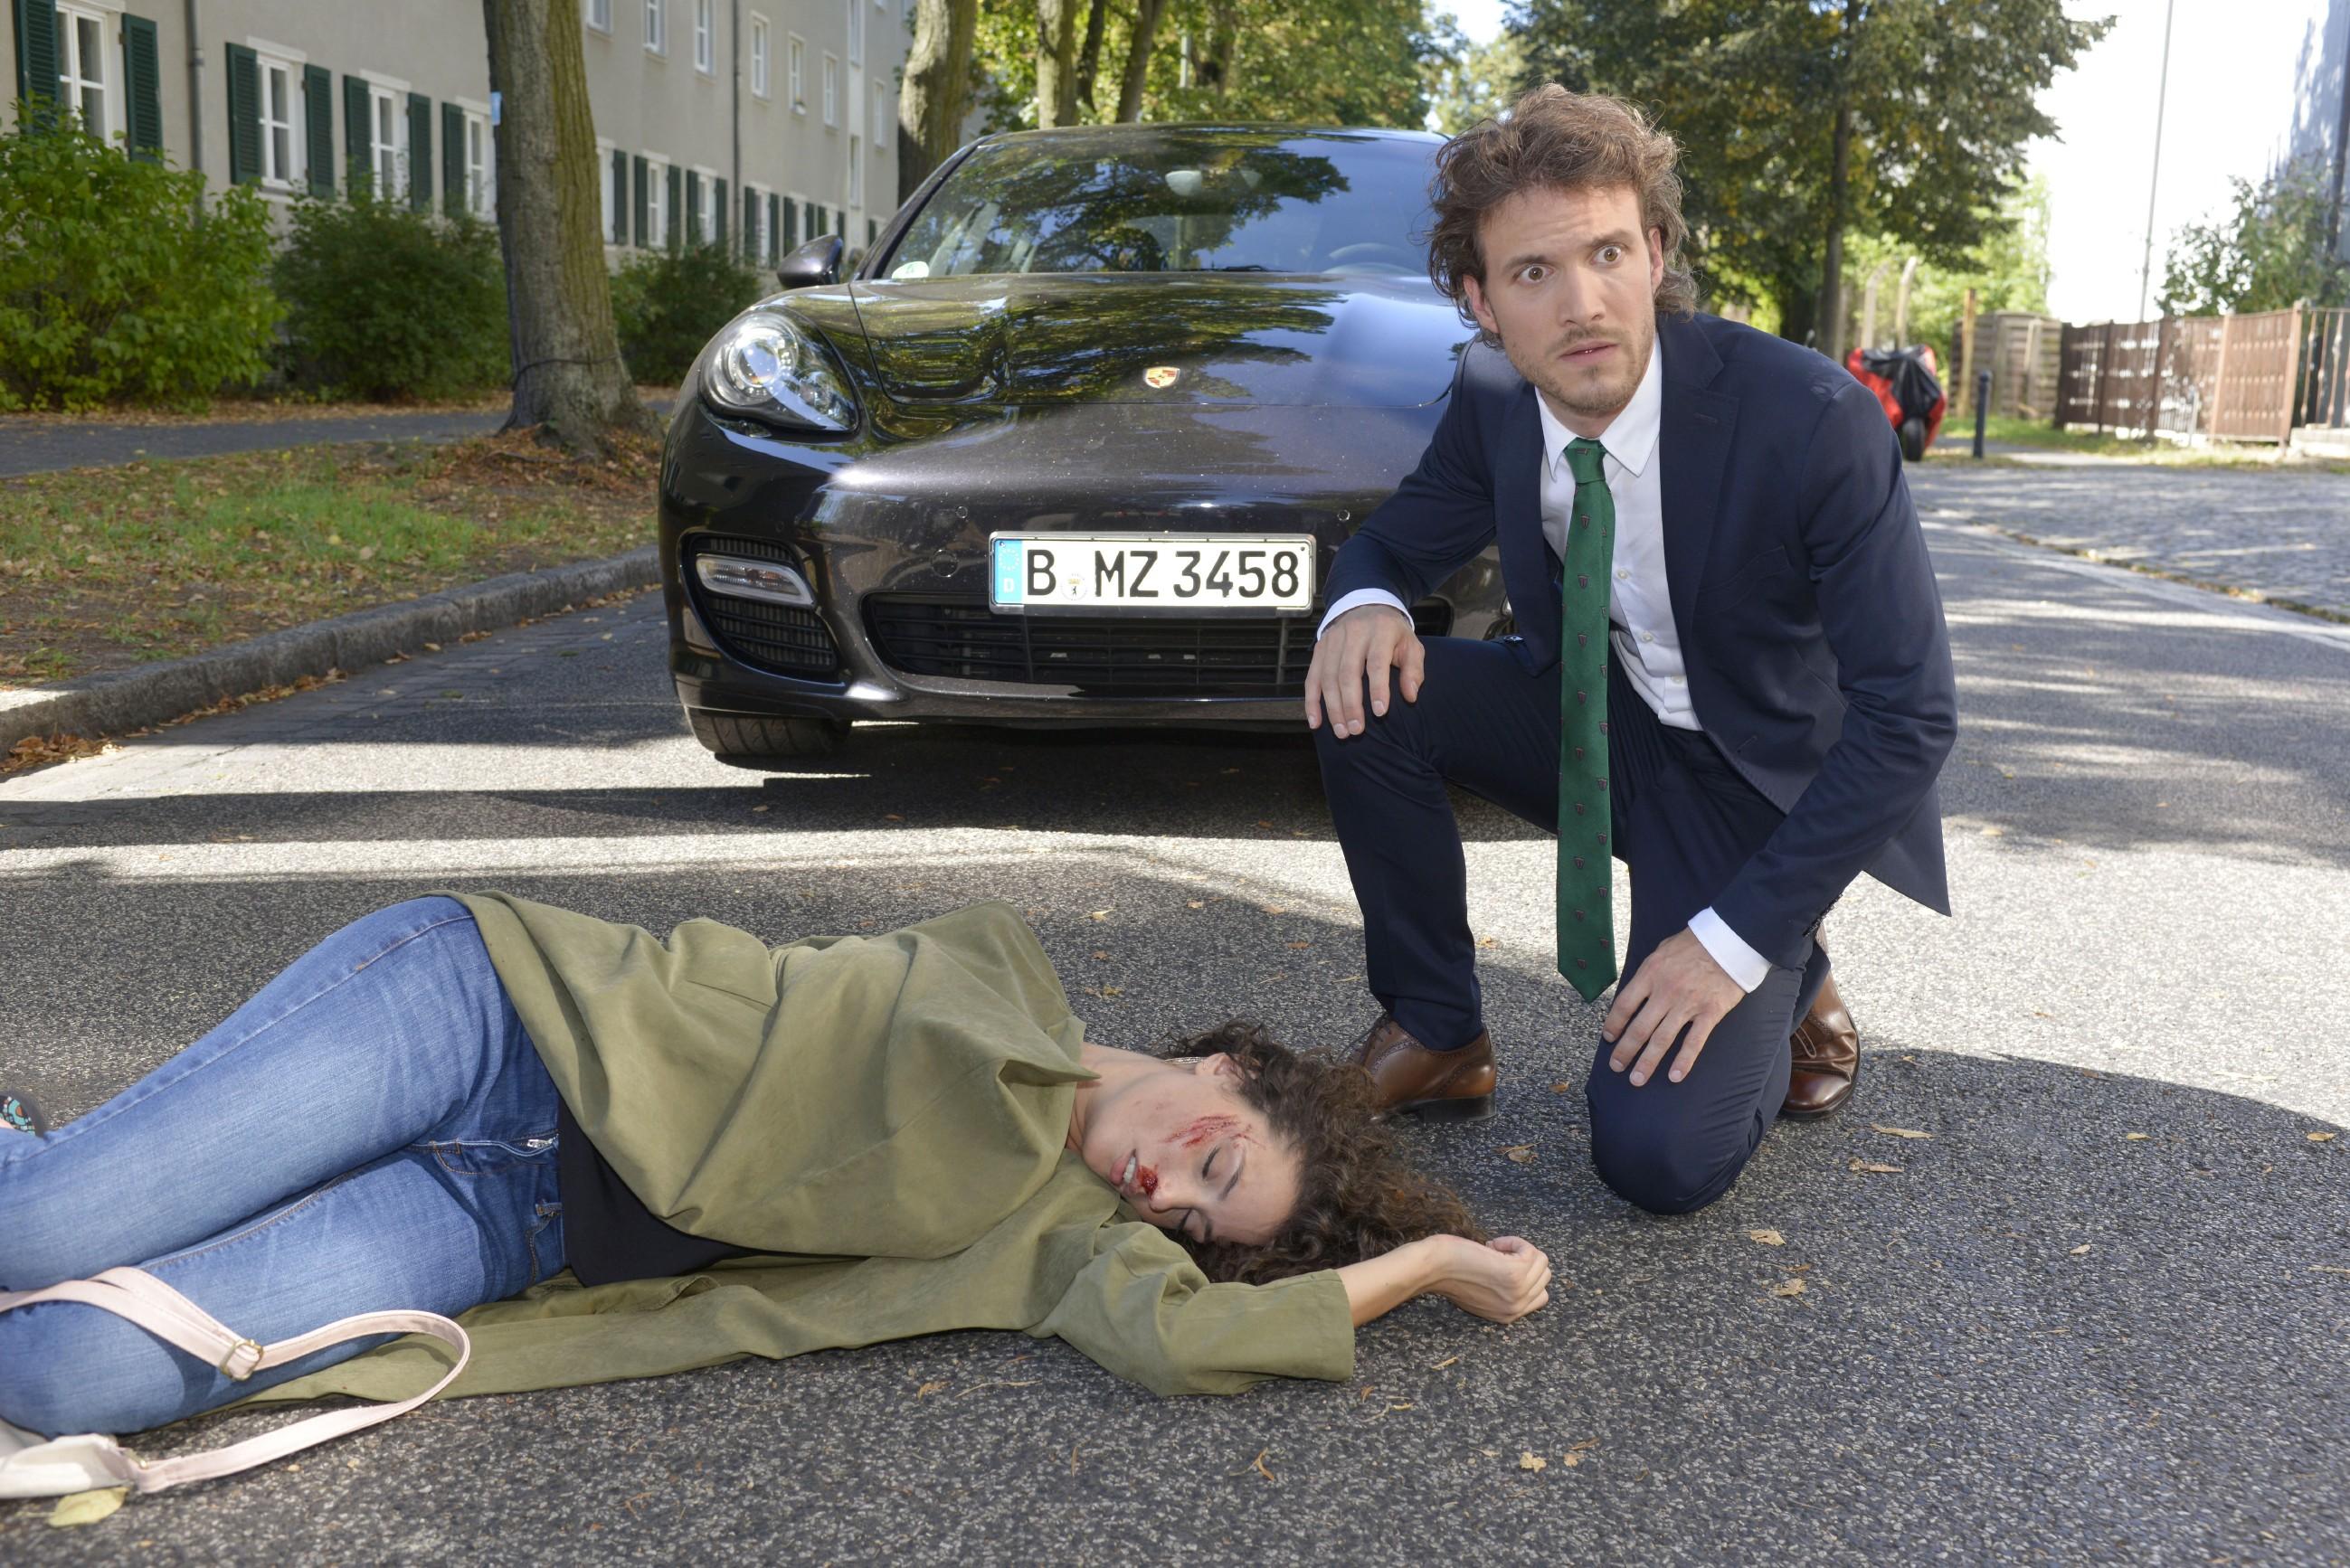 Felix (Thaddäus Meilinger) ist geschockt, als er realisiert, dass er Ayla (Nadine Menz) angefahren hat...